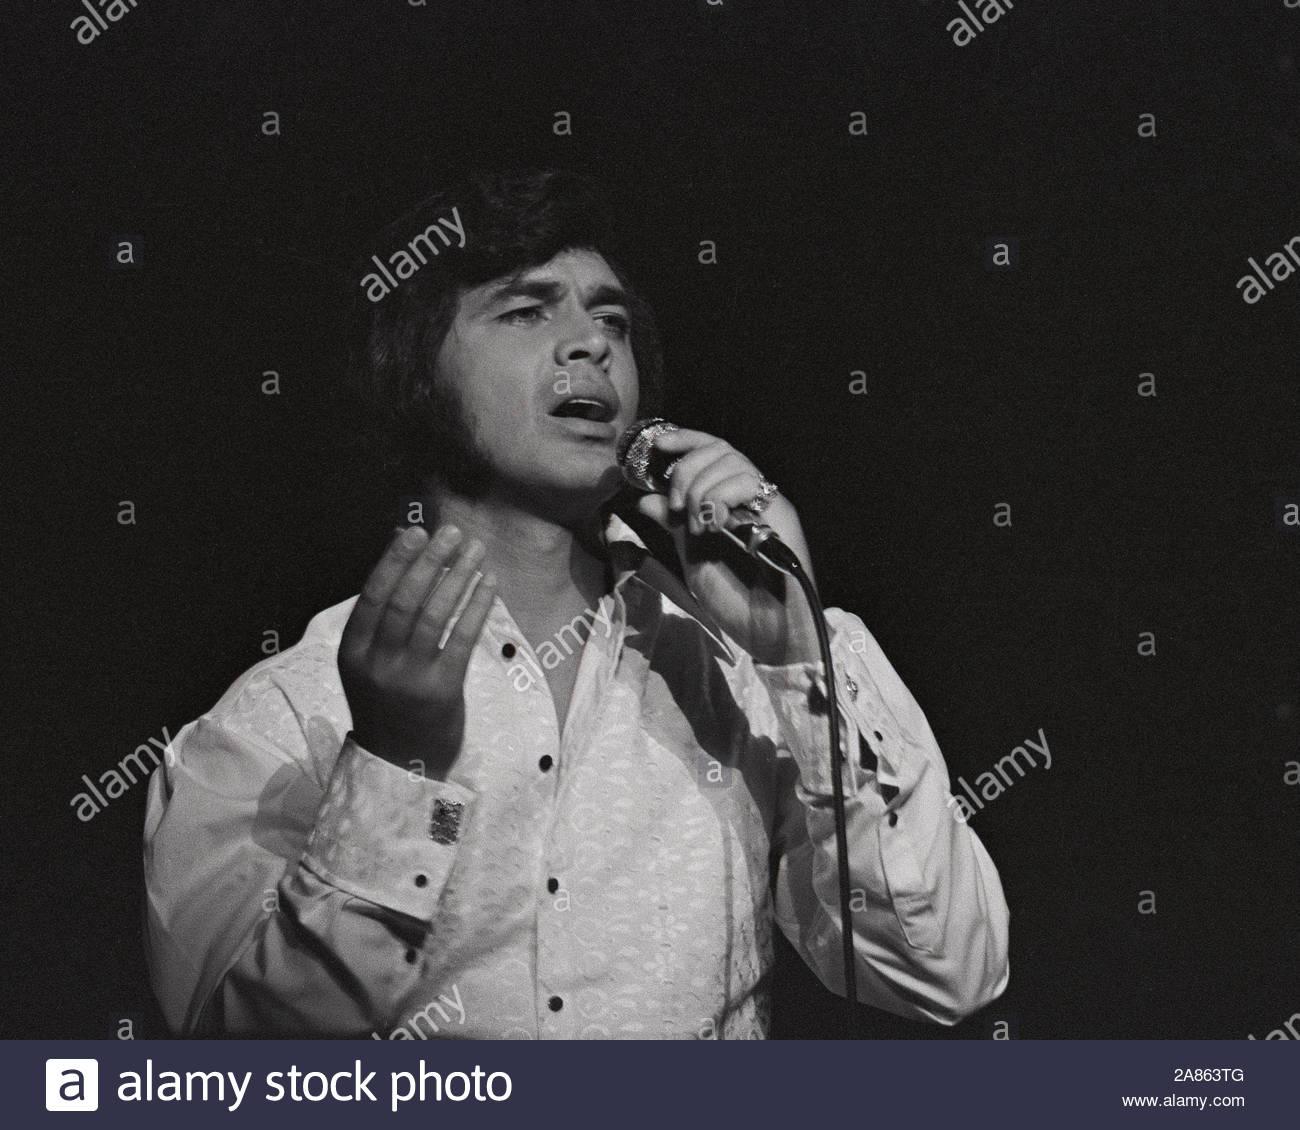 1971 Singer ENGELBERT HUMPERDINCK ARIE CROWN THEATER Photo 022 Opening Night